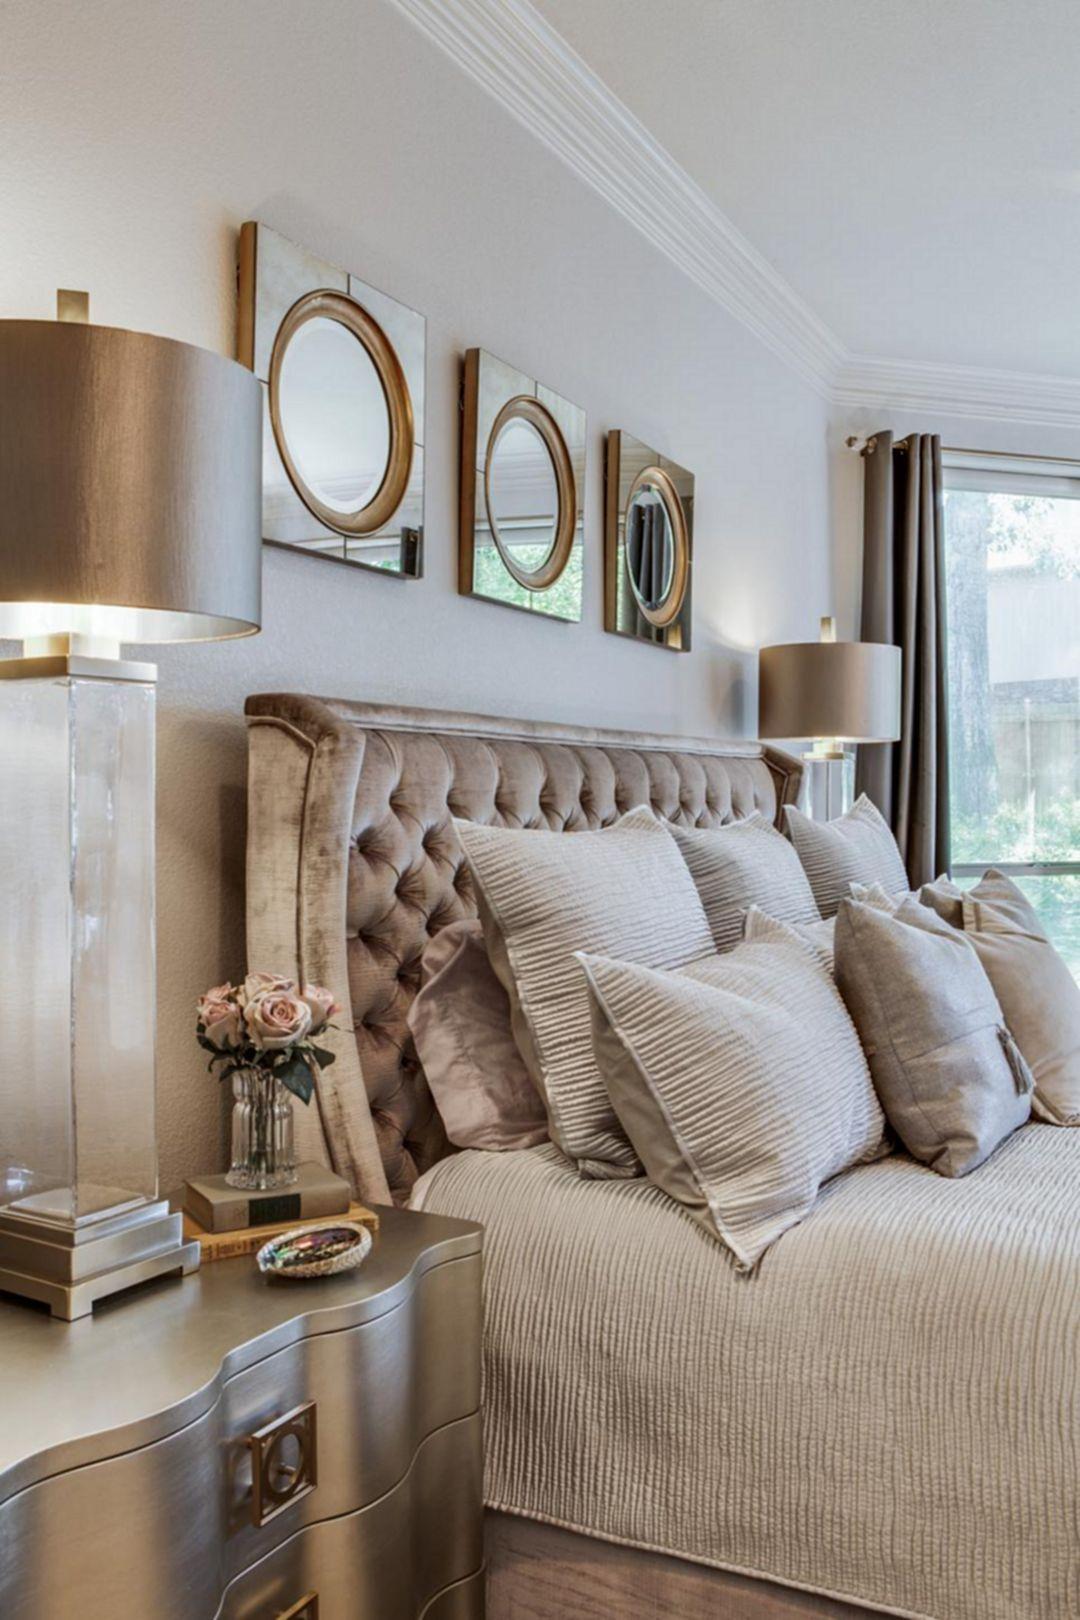 Romantic Master Bedroom Designs 150 Amazing Romantic Master Bedroom Design Ideas You Have To Try